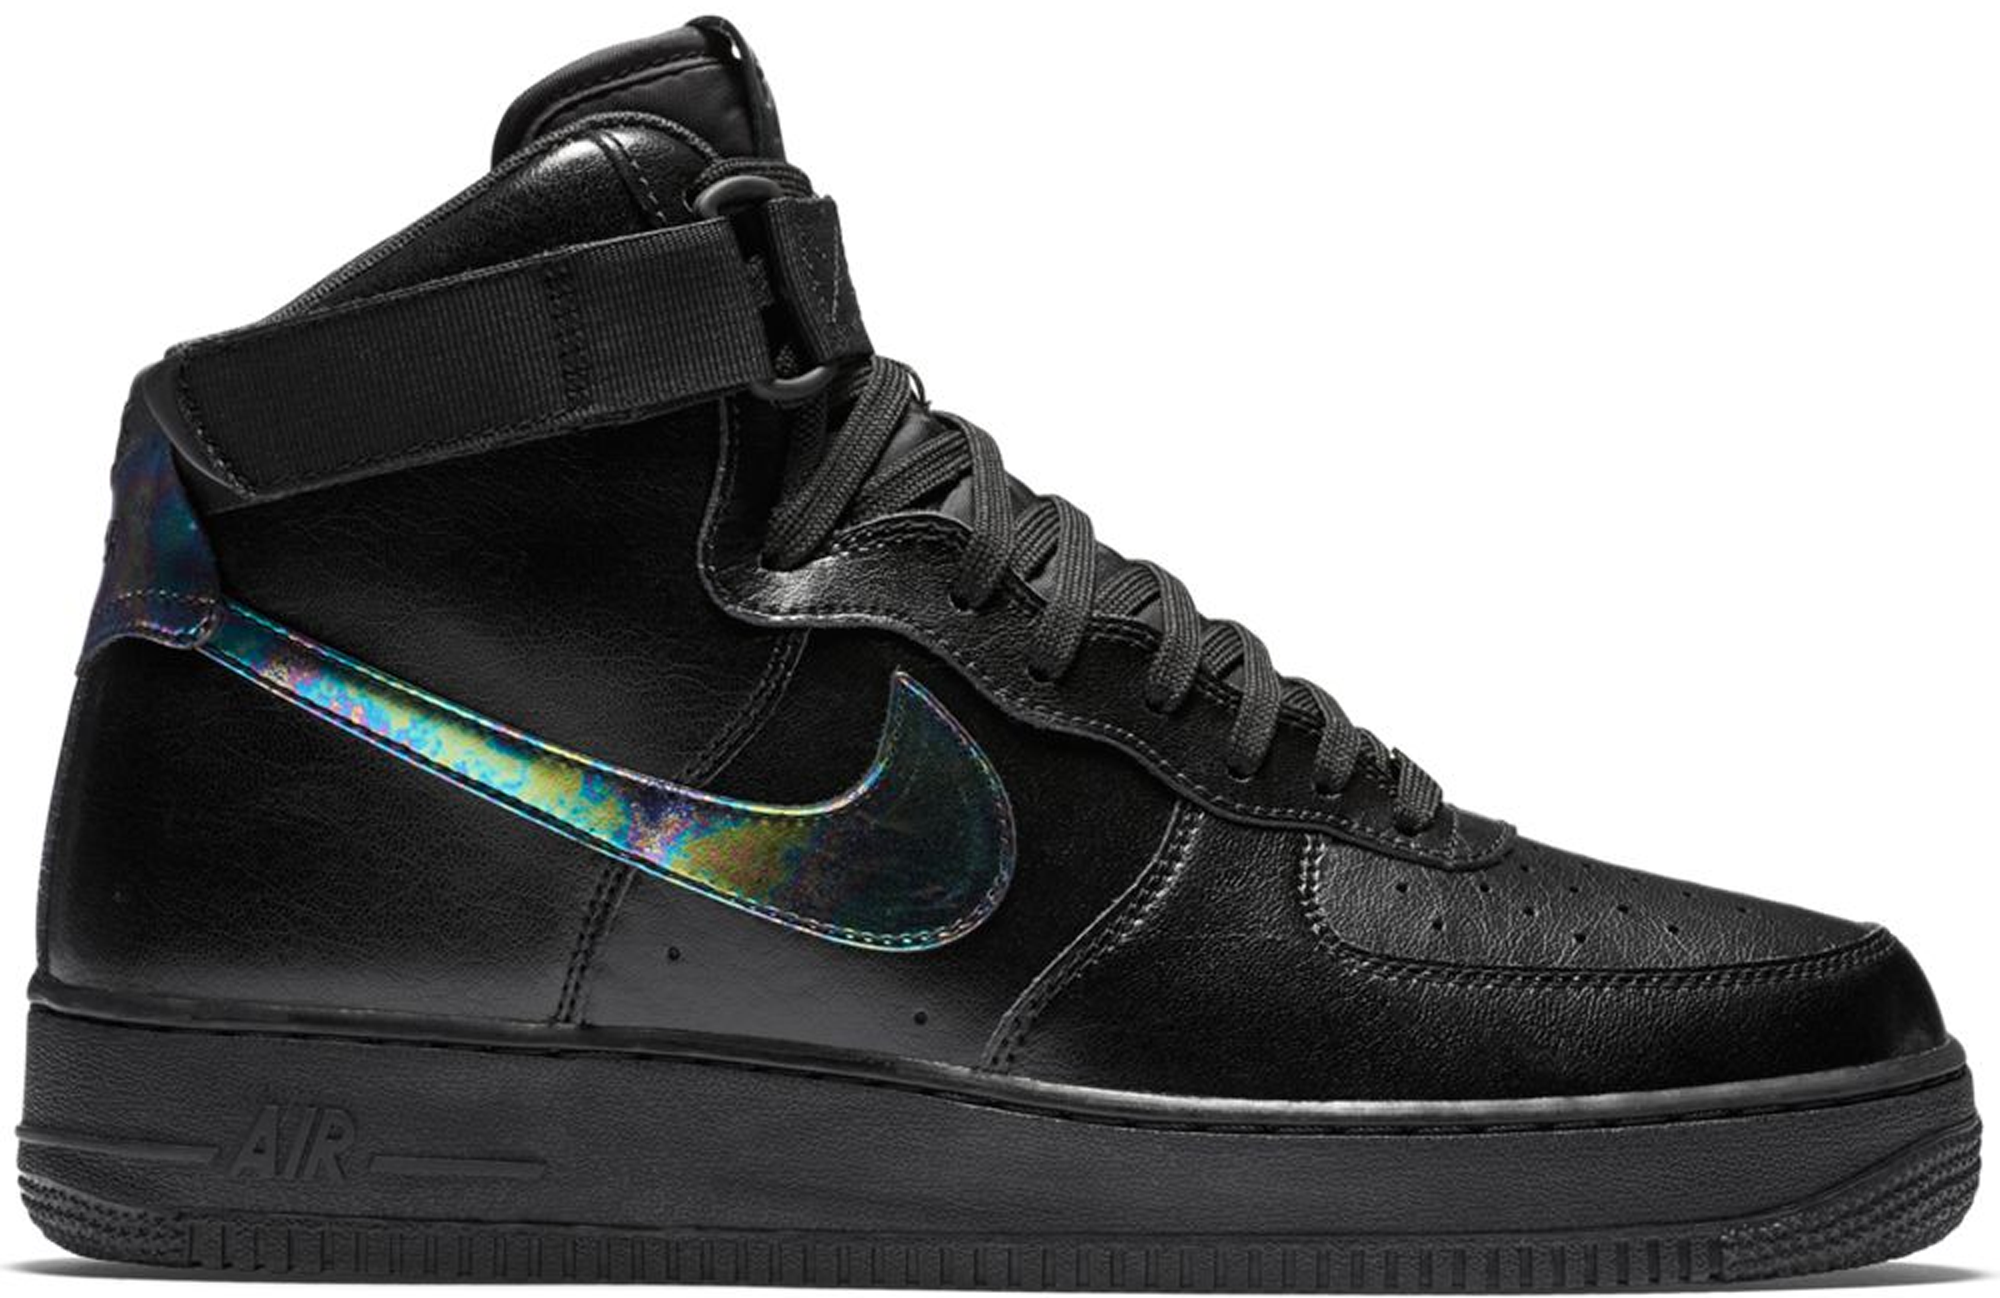 Nike Air Force 1 High Black Iridescent